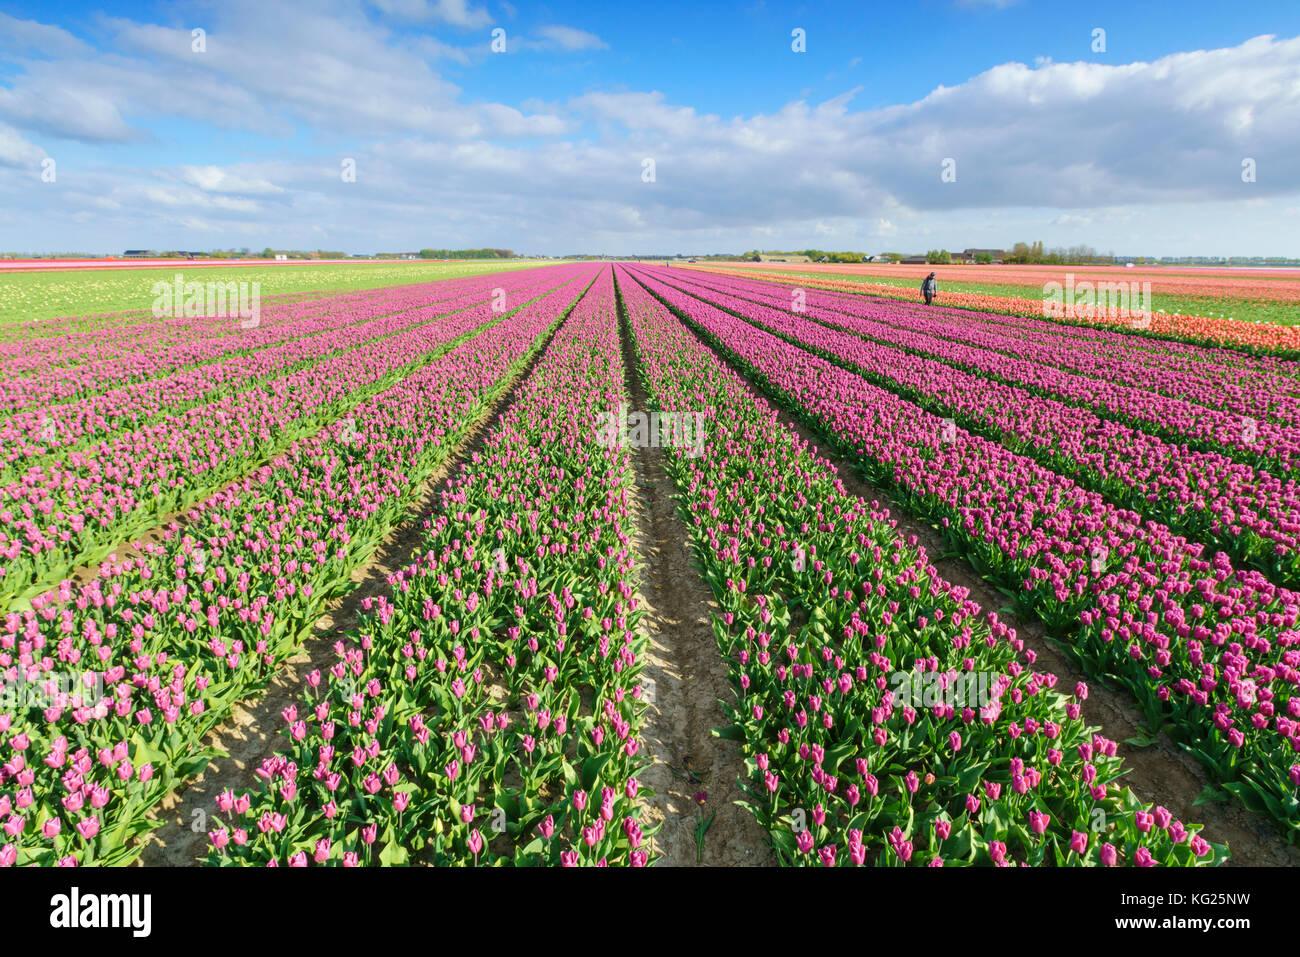 Rosa Tulpen im Feld, yersekendam, Provinz Zeeland, Niederlande, Europa Stockbild